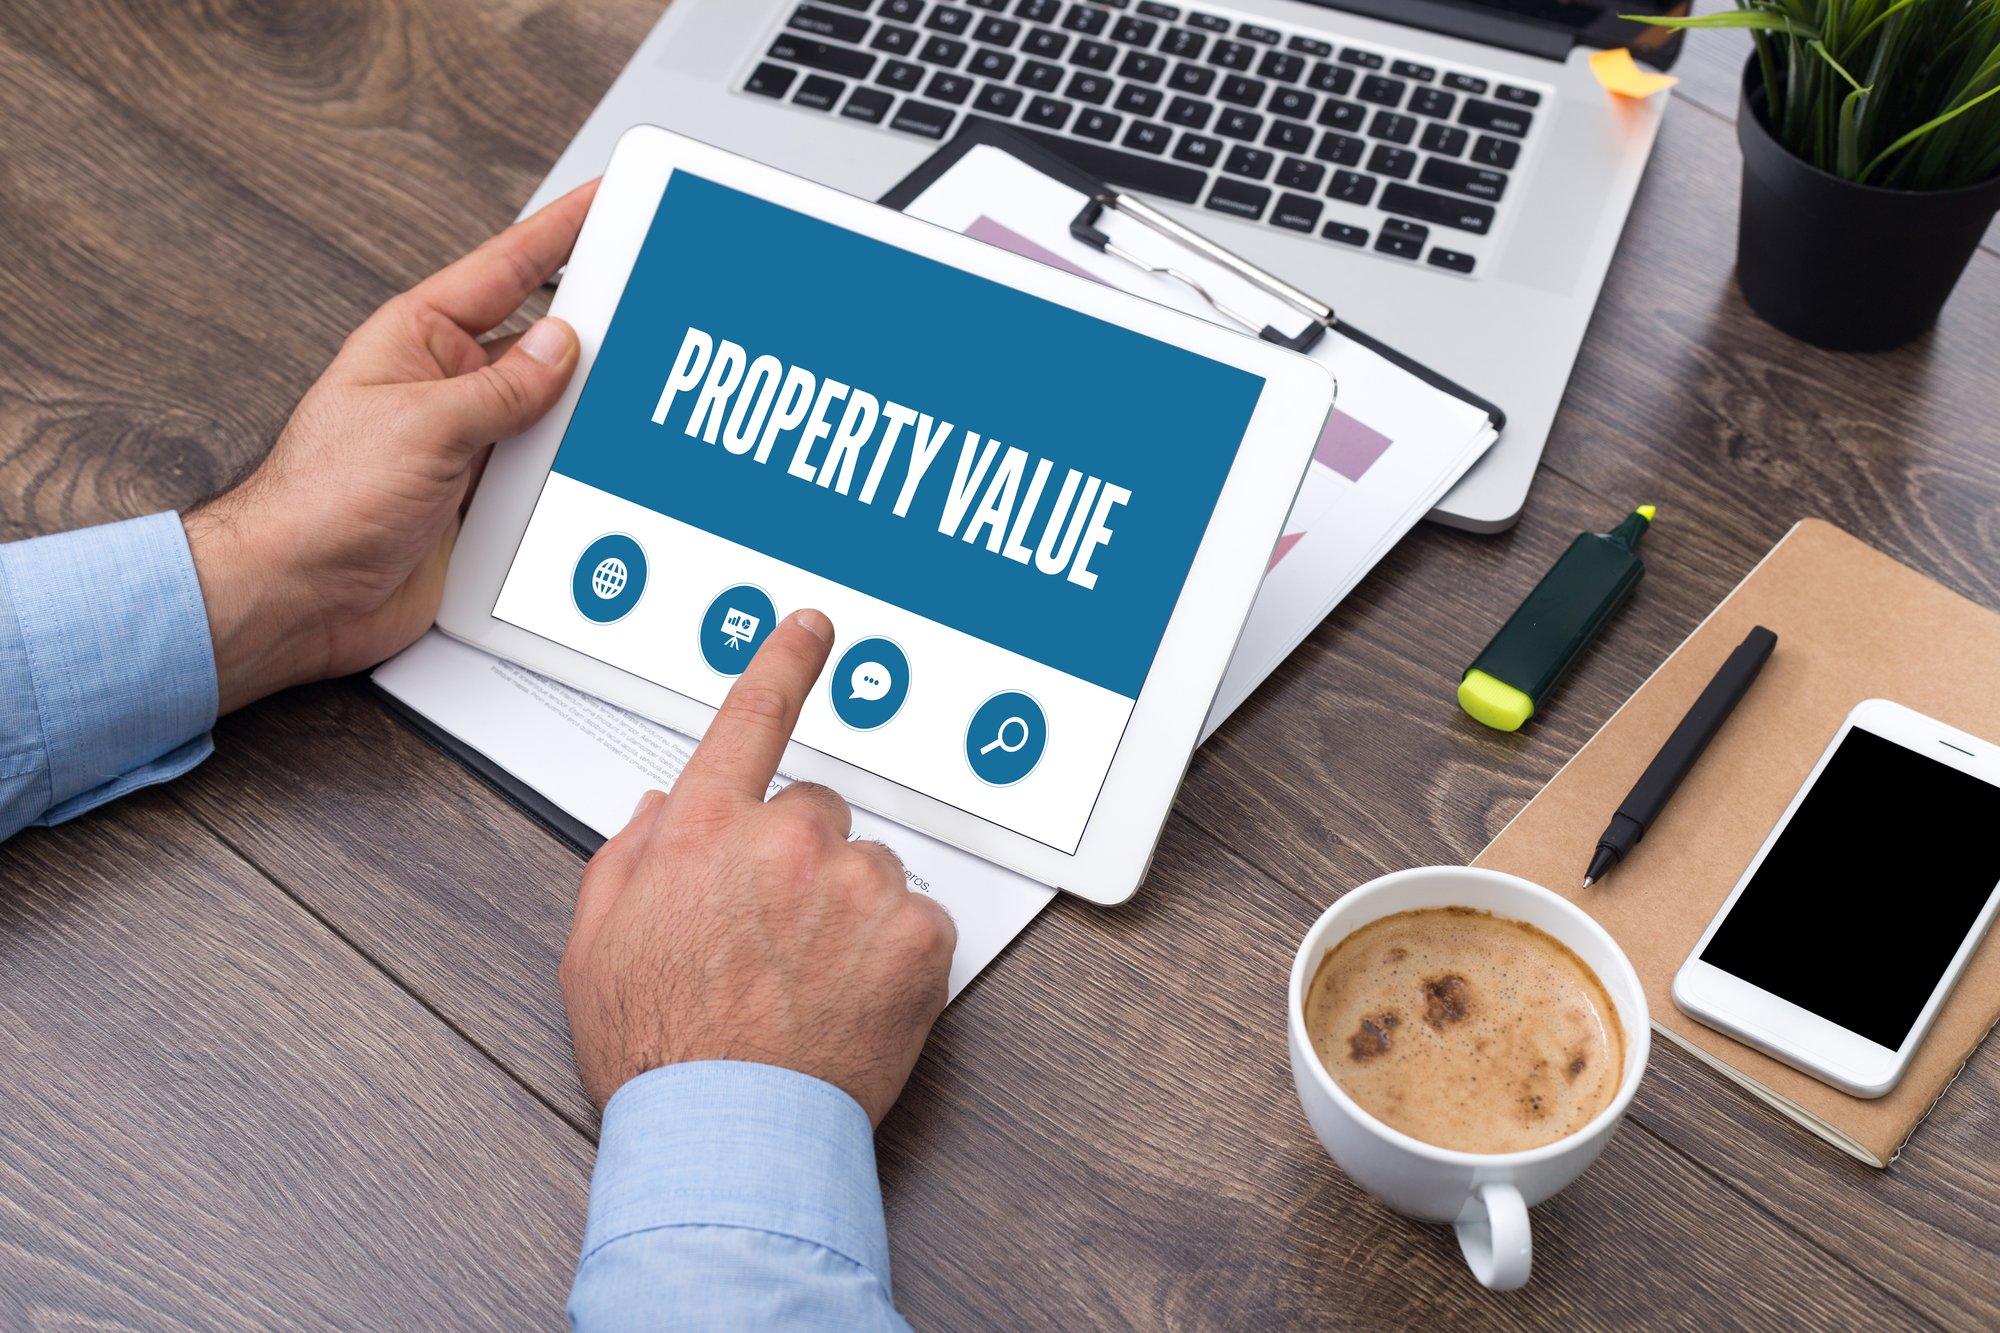 property-value-2.jpg